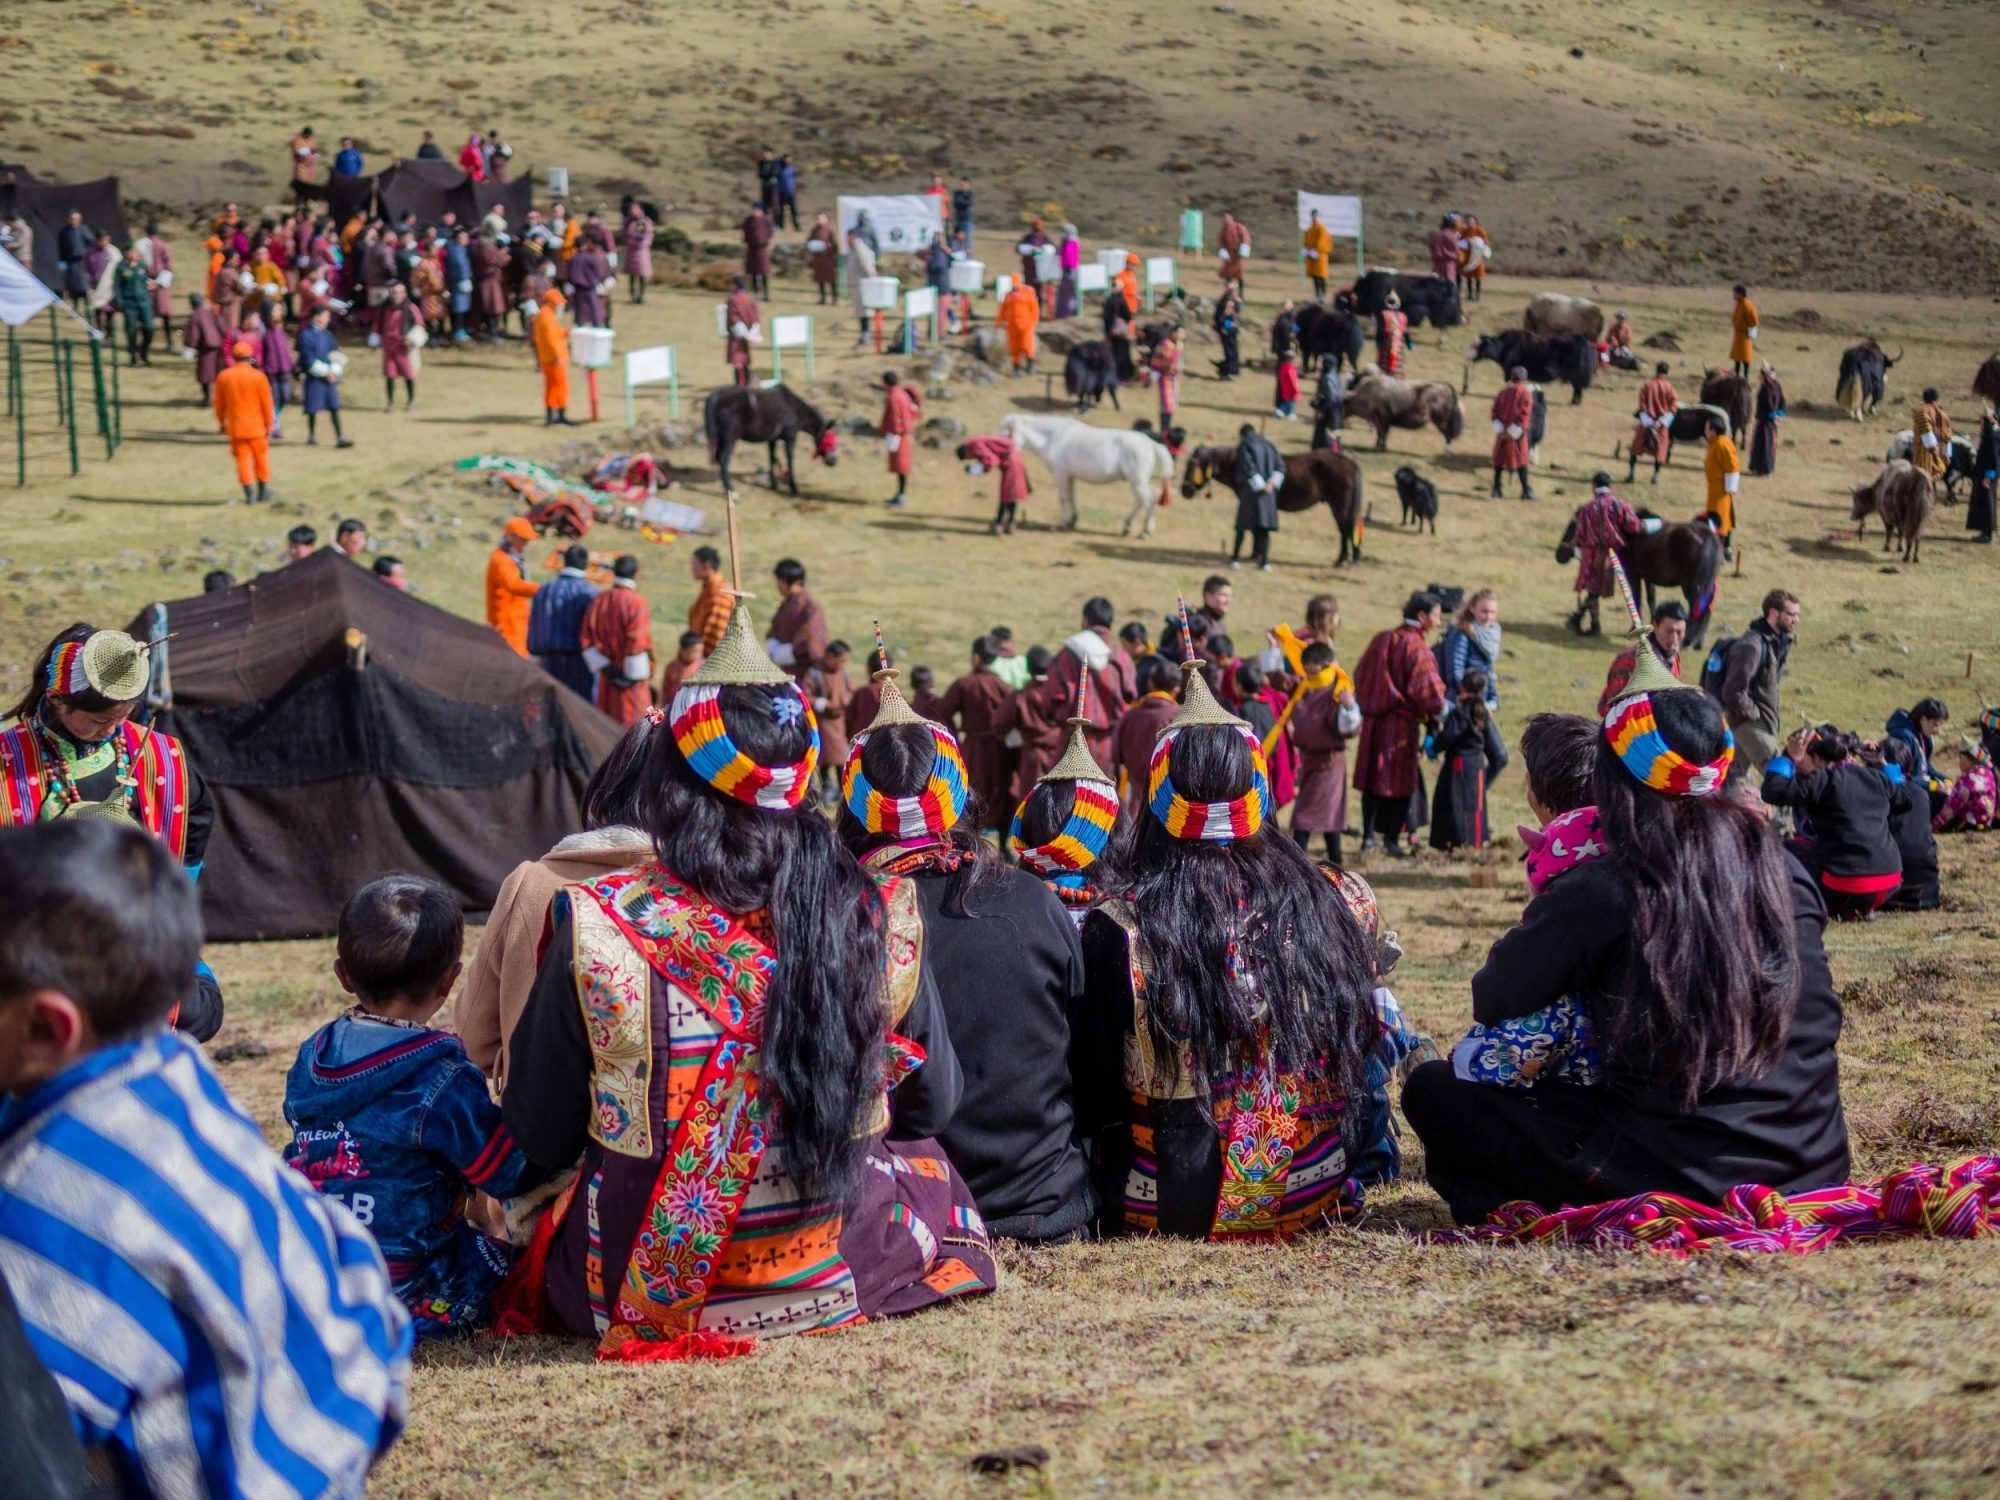 Royal Highlander Festival, Bhutan. Photo by Anubha Momin.